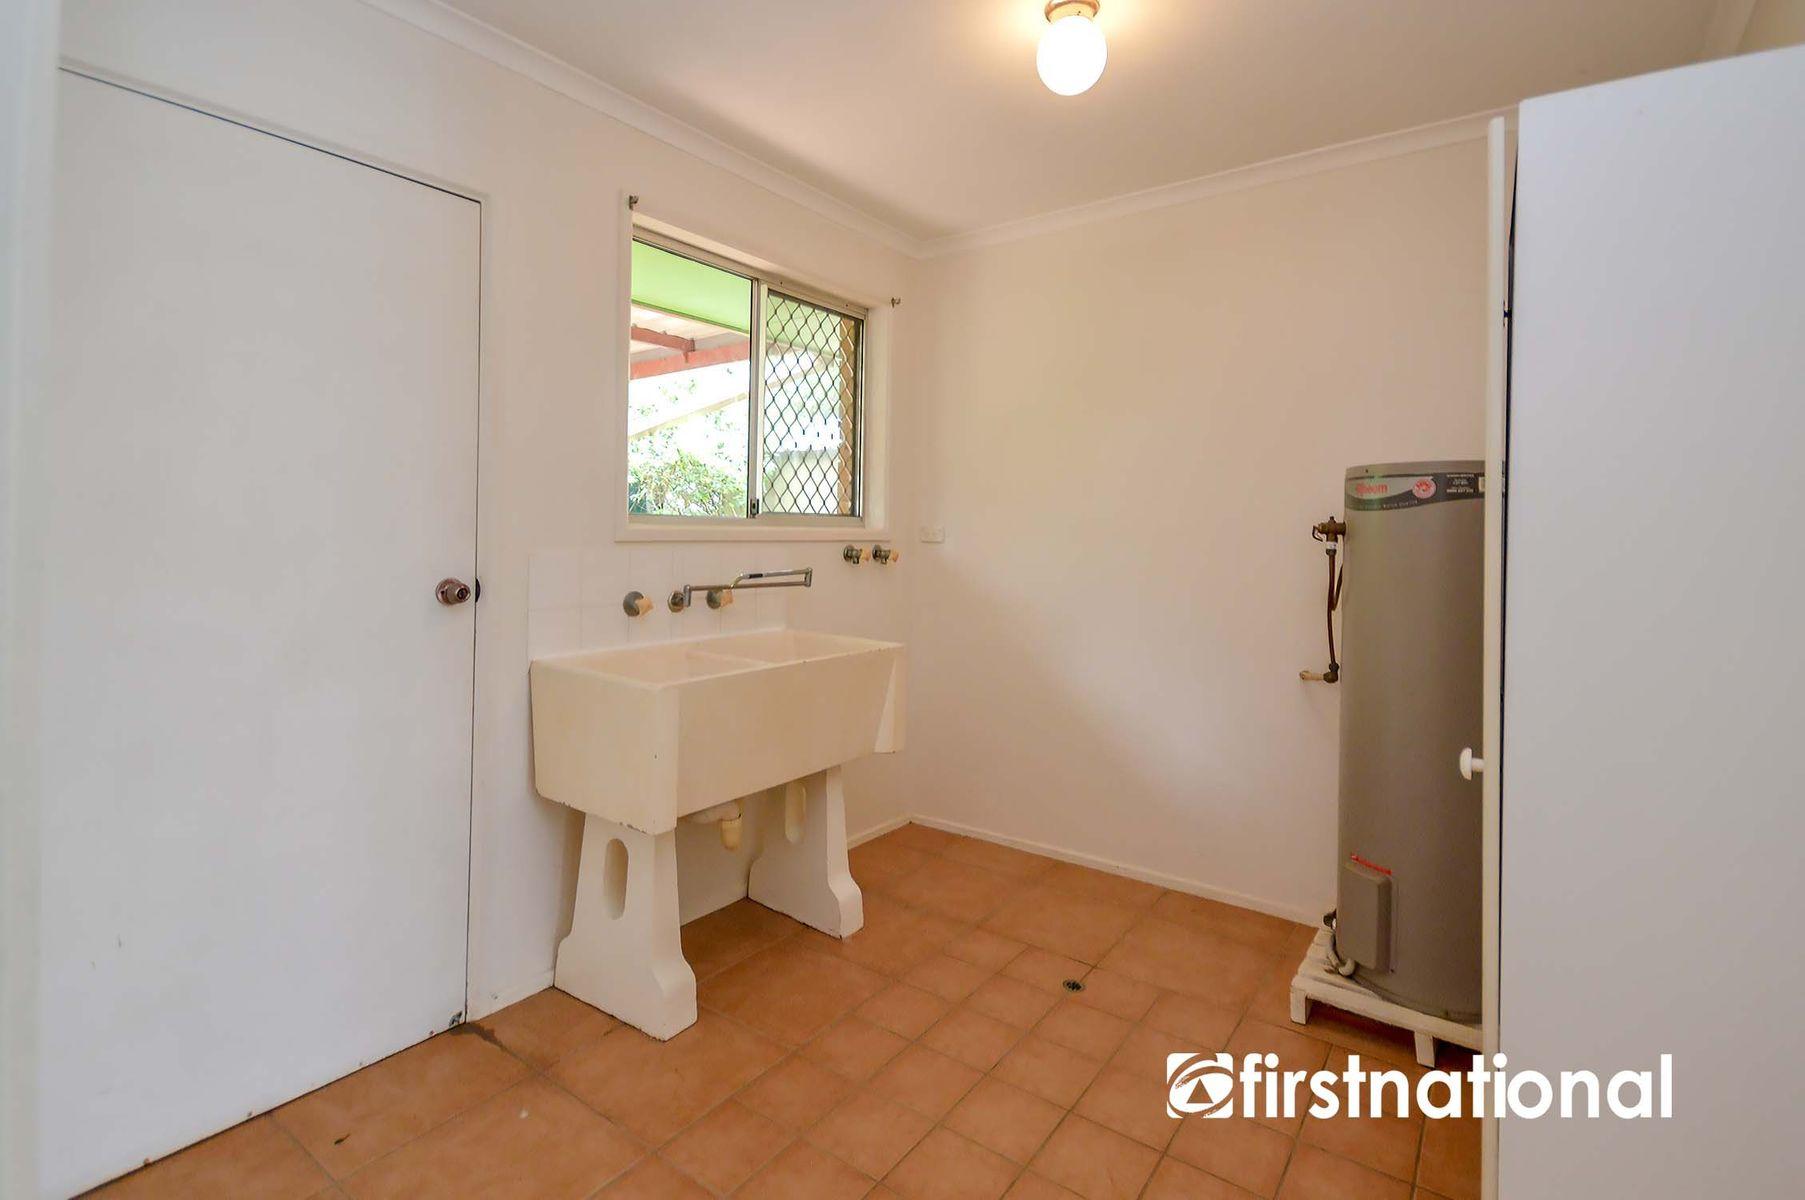 27 Jenyns Road, Tamborine Mountain, QLD 4272